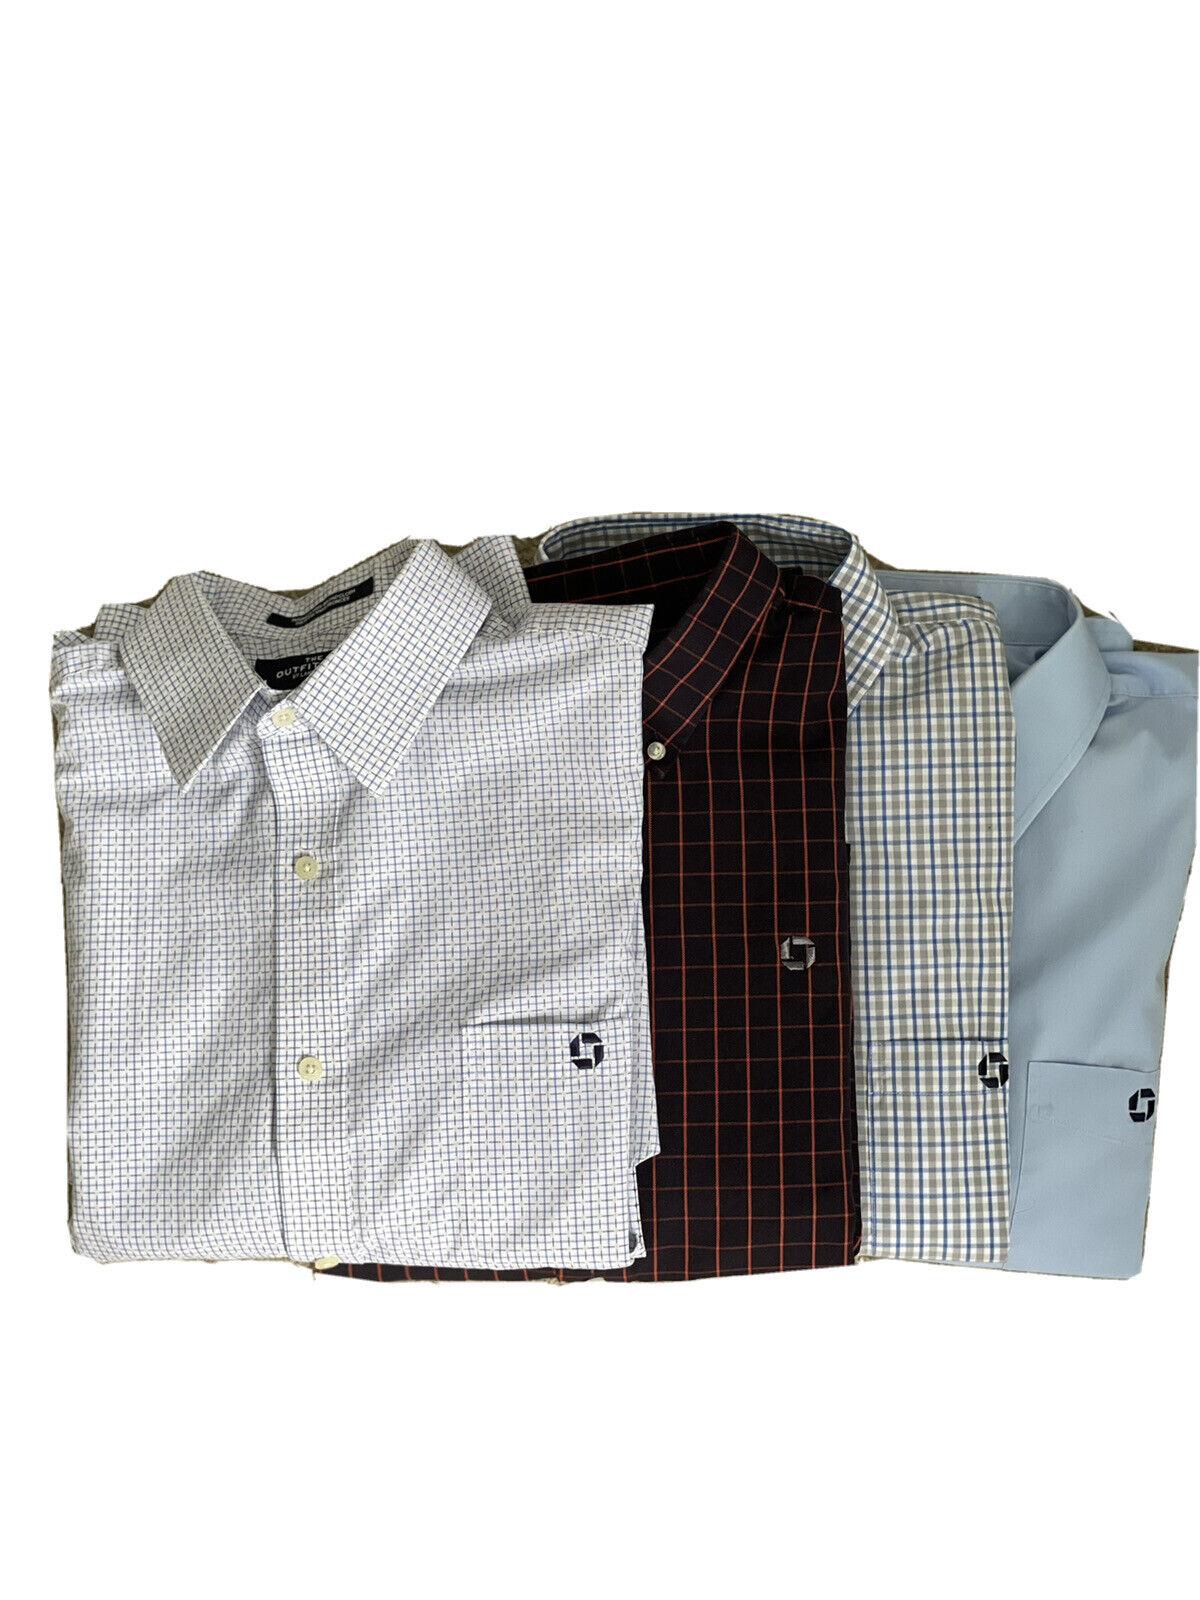 Chase Bank Lands' End Women/'s Uniform Sz Small Black EUC 3//4 Sweater Cardigan